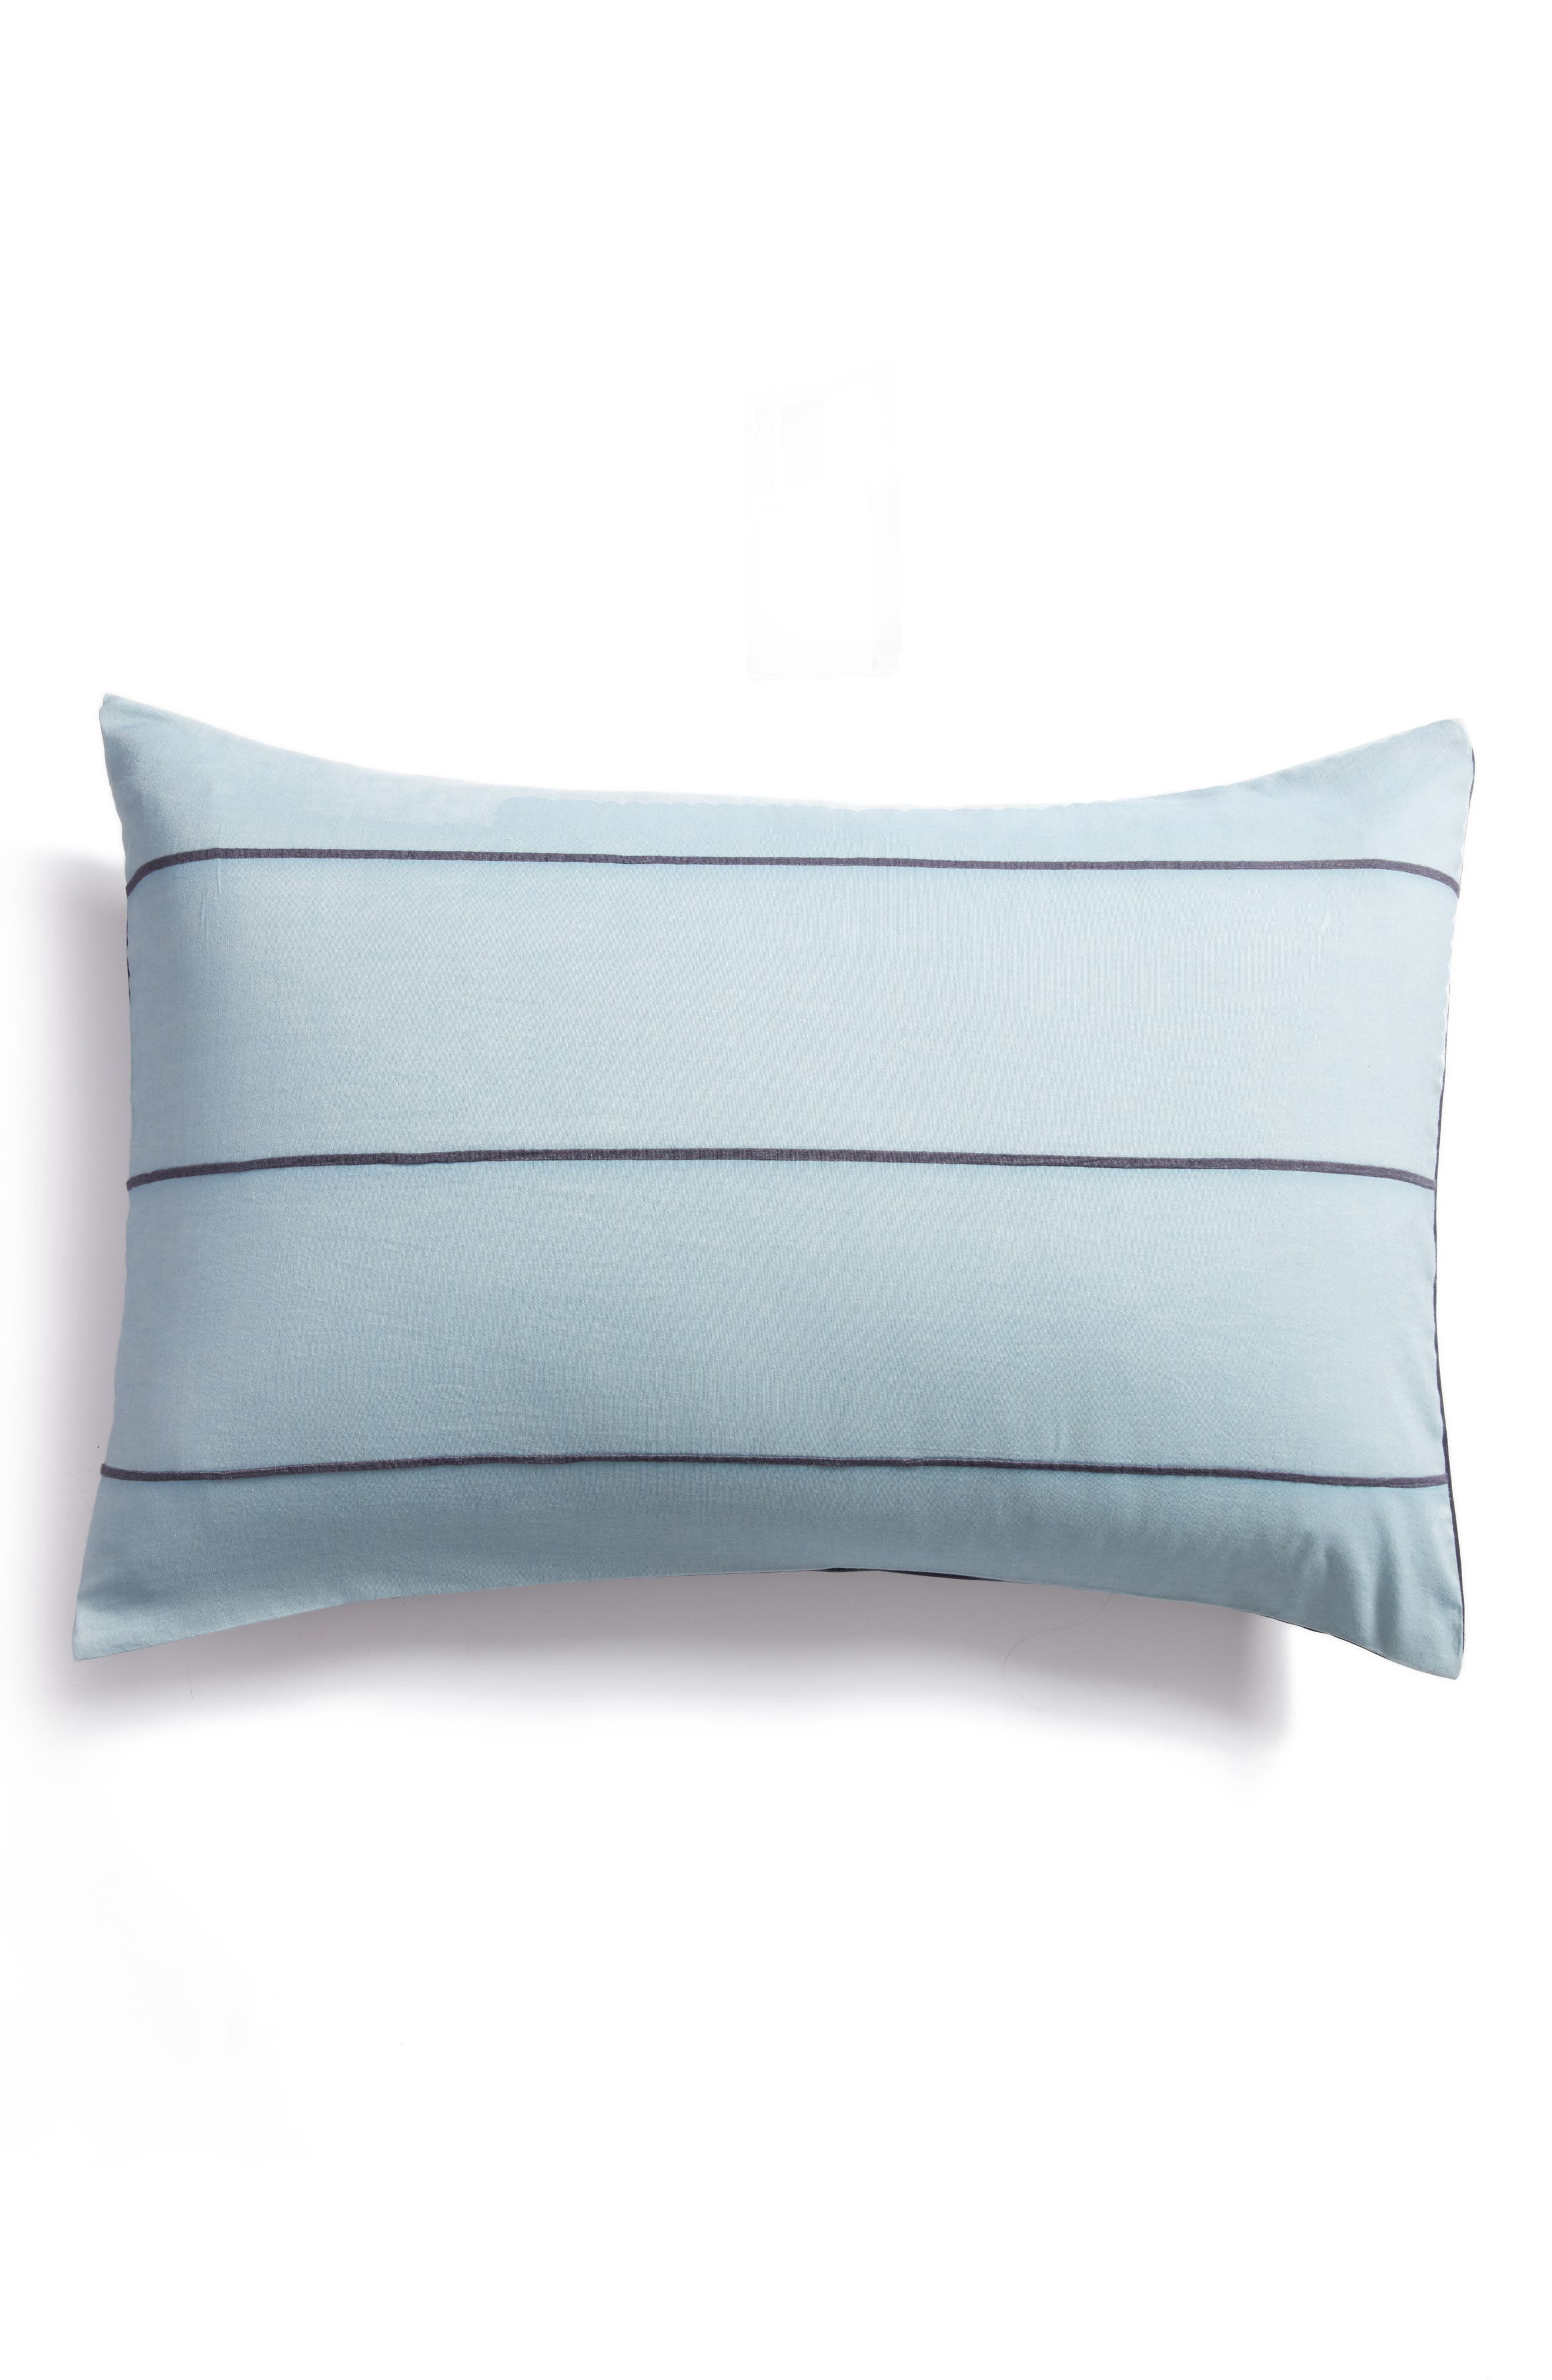 Textured Stripe Pillow Sham,                             Main thumbnail 1, color,                             Blue Ashley